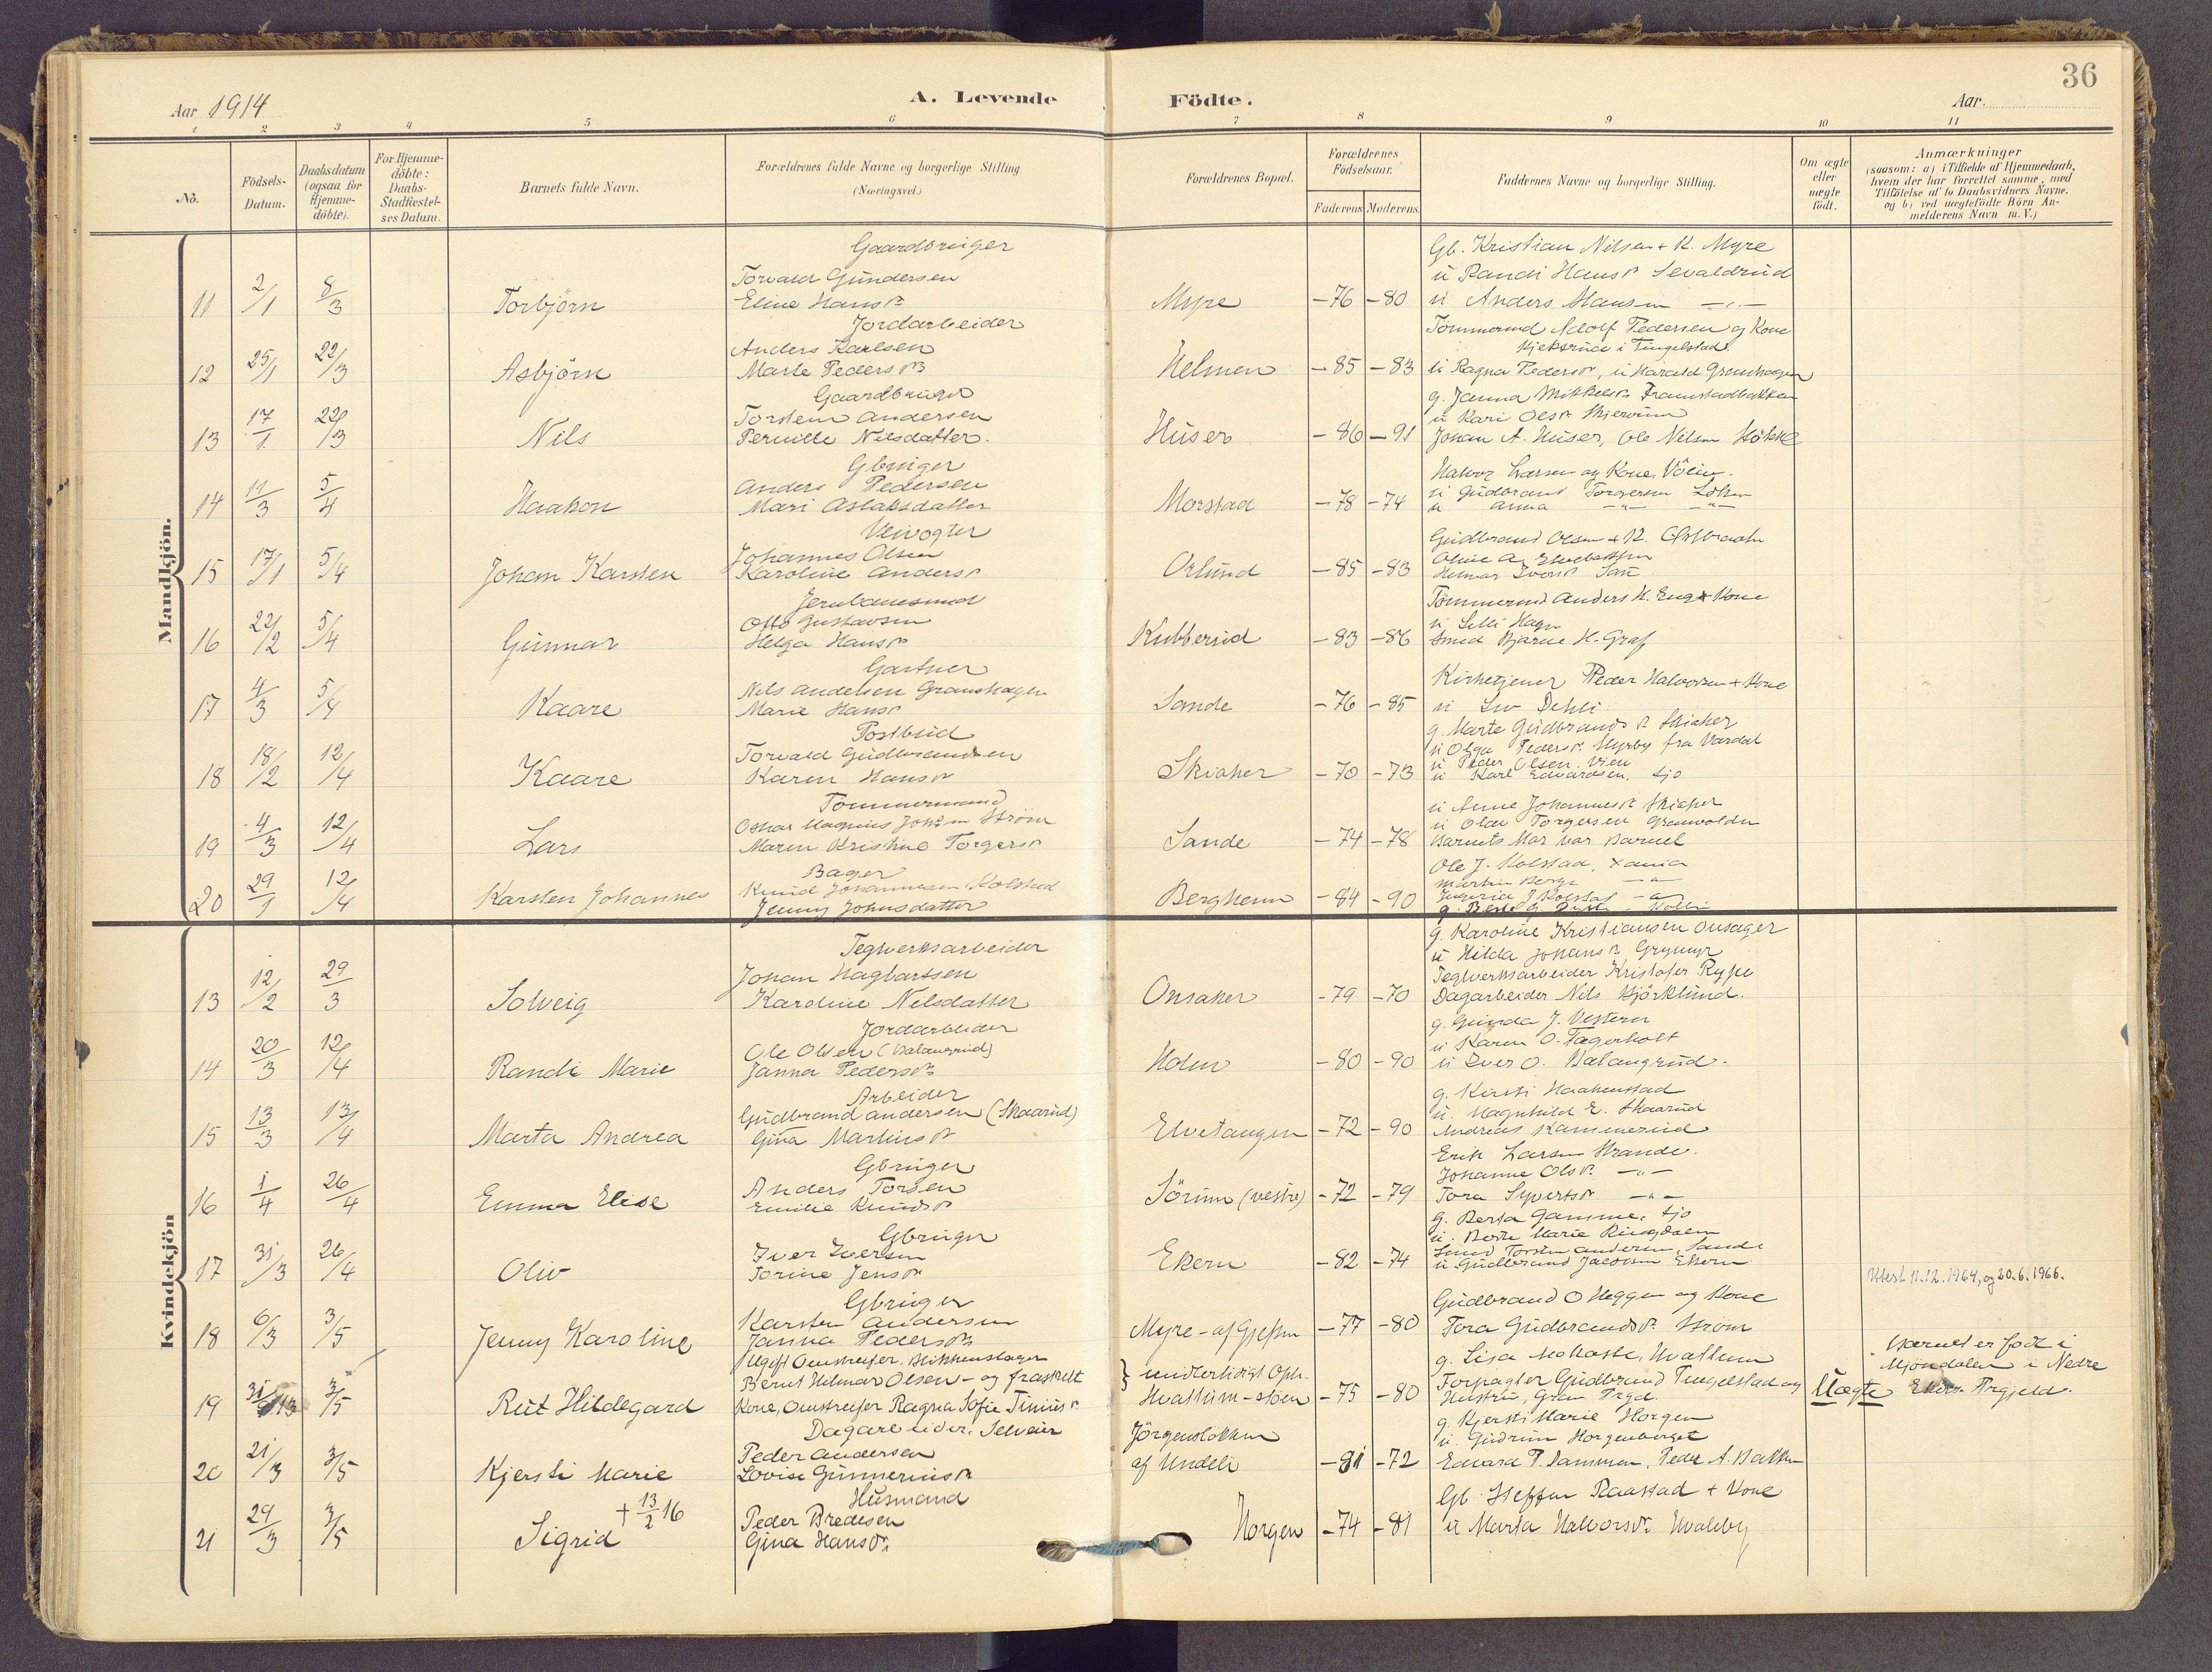 SAH, Gran prestekontor, Parish register (official) no. 21, 1908-1932, p. 36